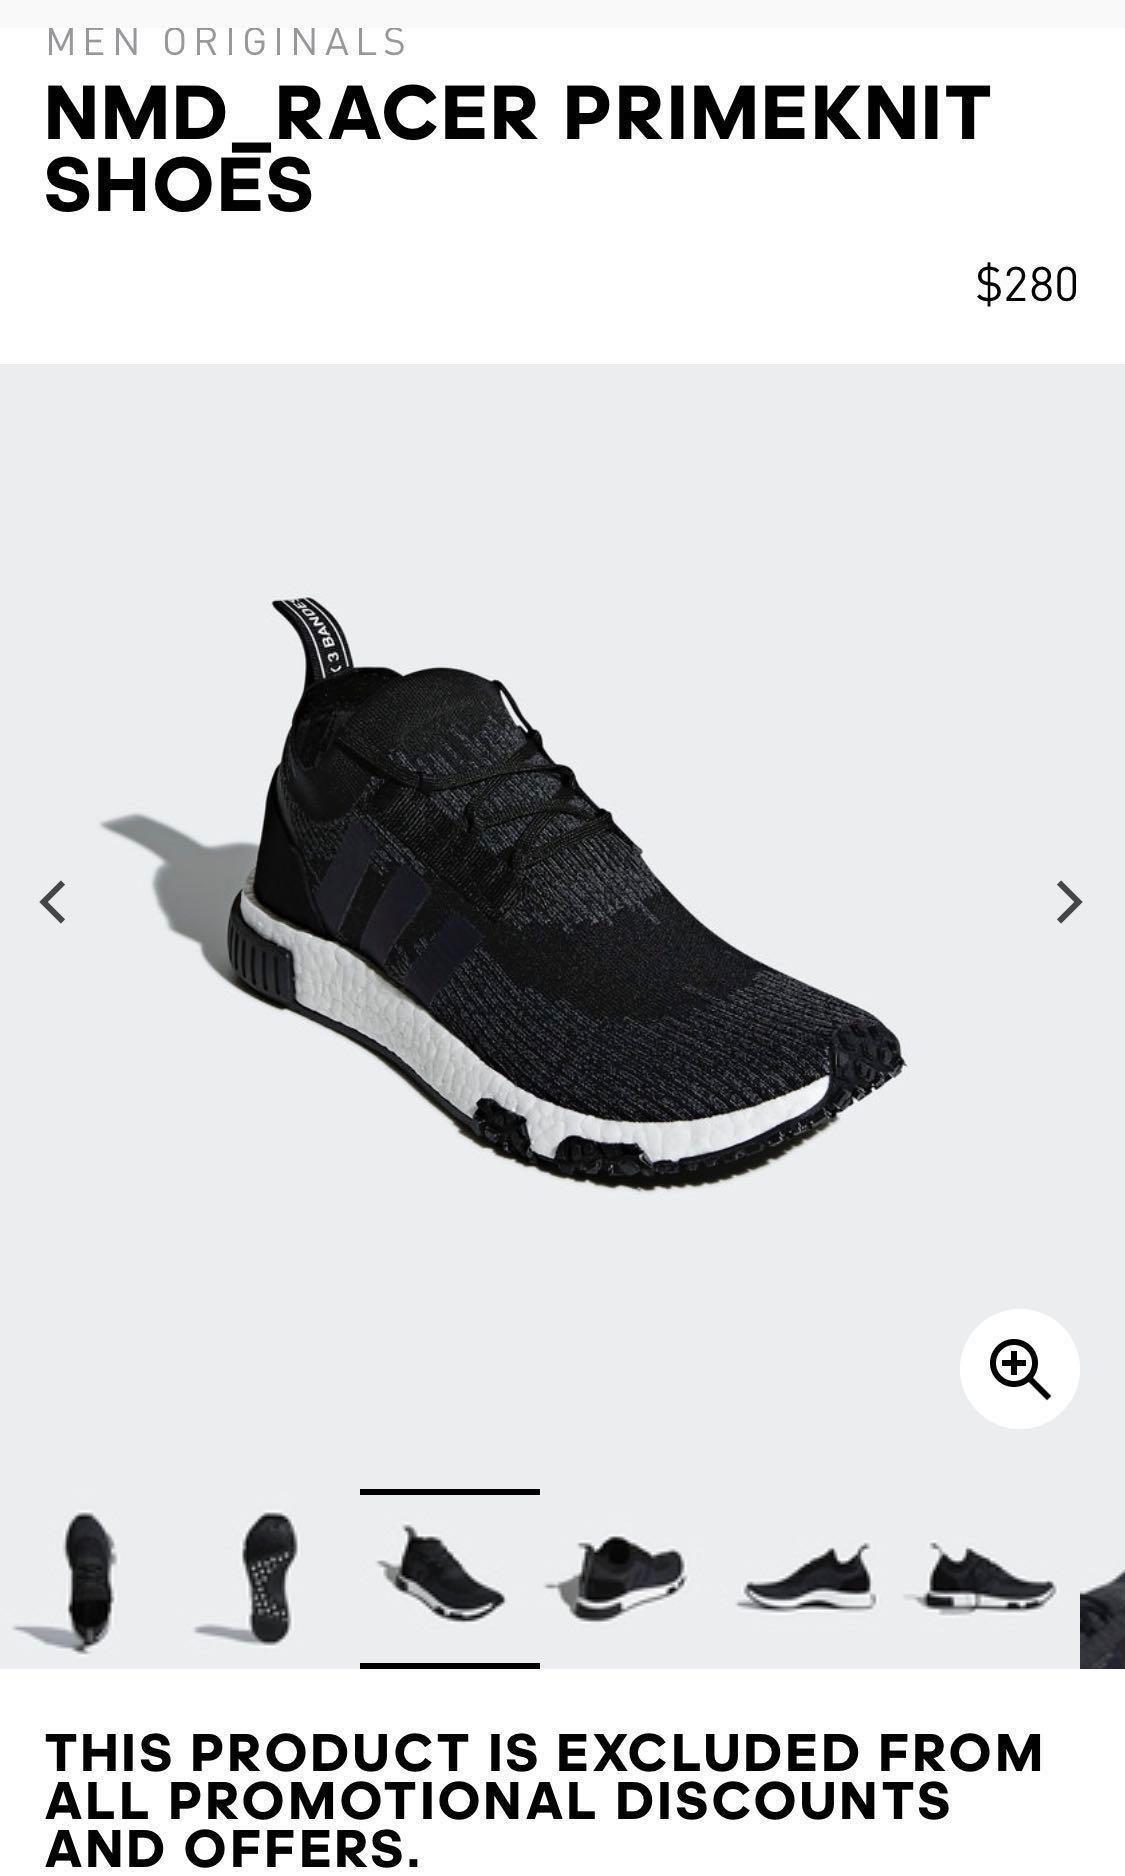 Adidas NMD PrimeKnit trainers BNIB, Men